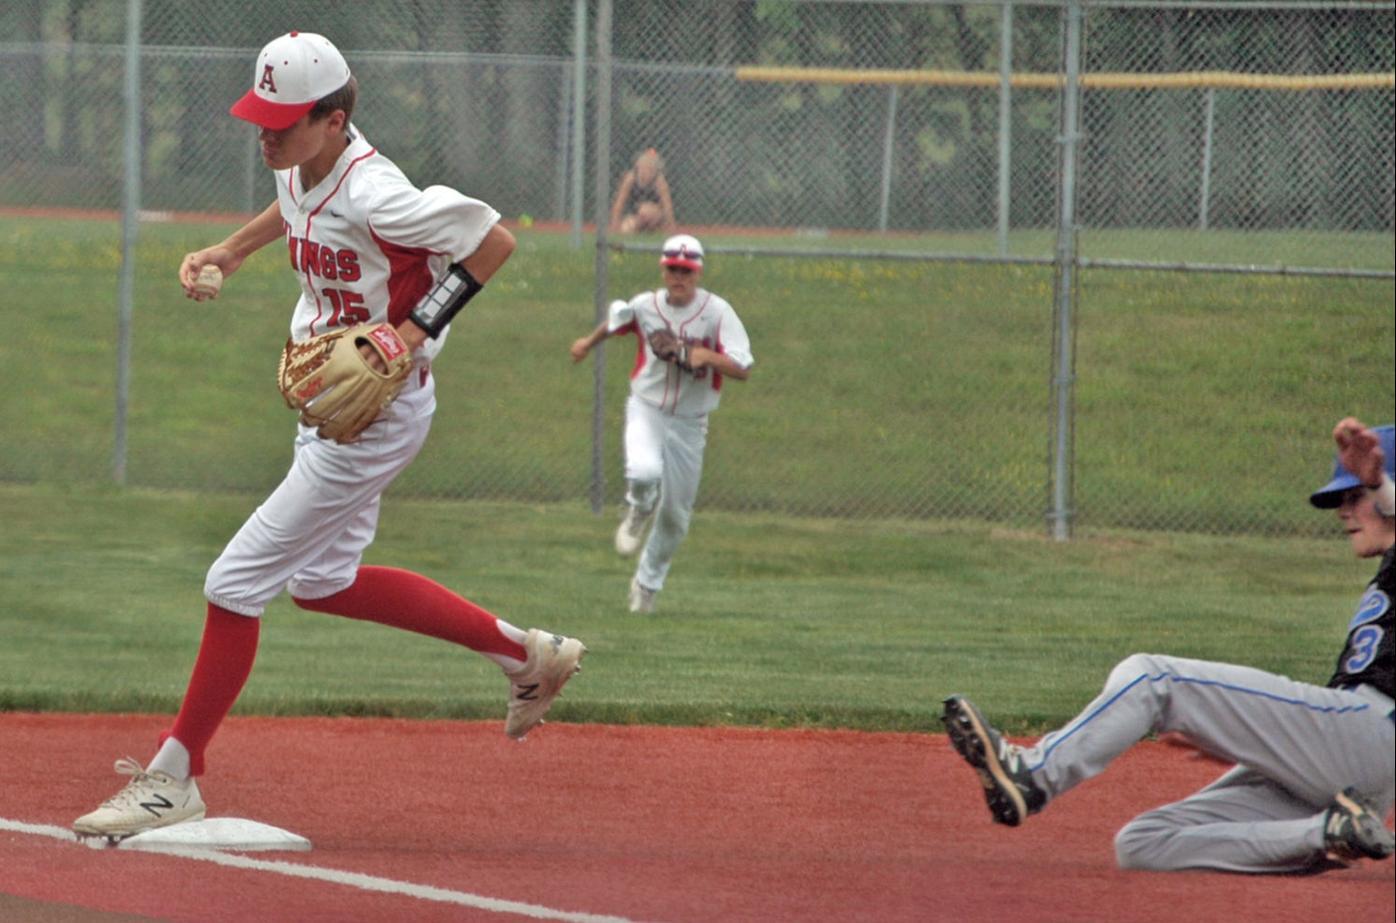 Wellborn tags third base